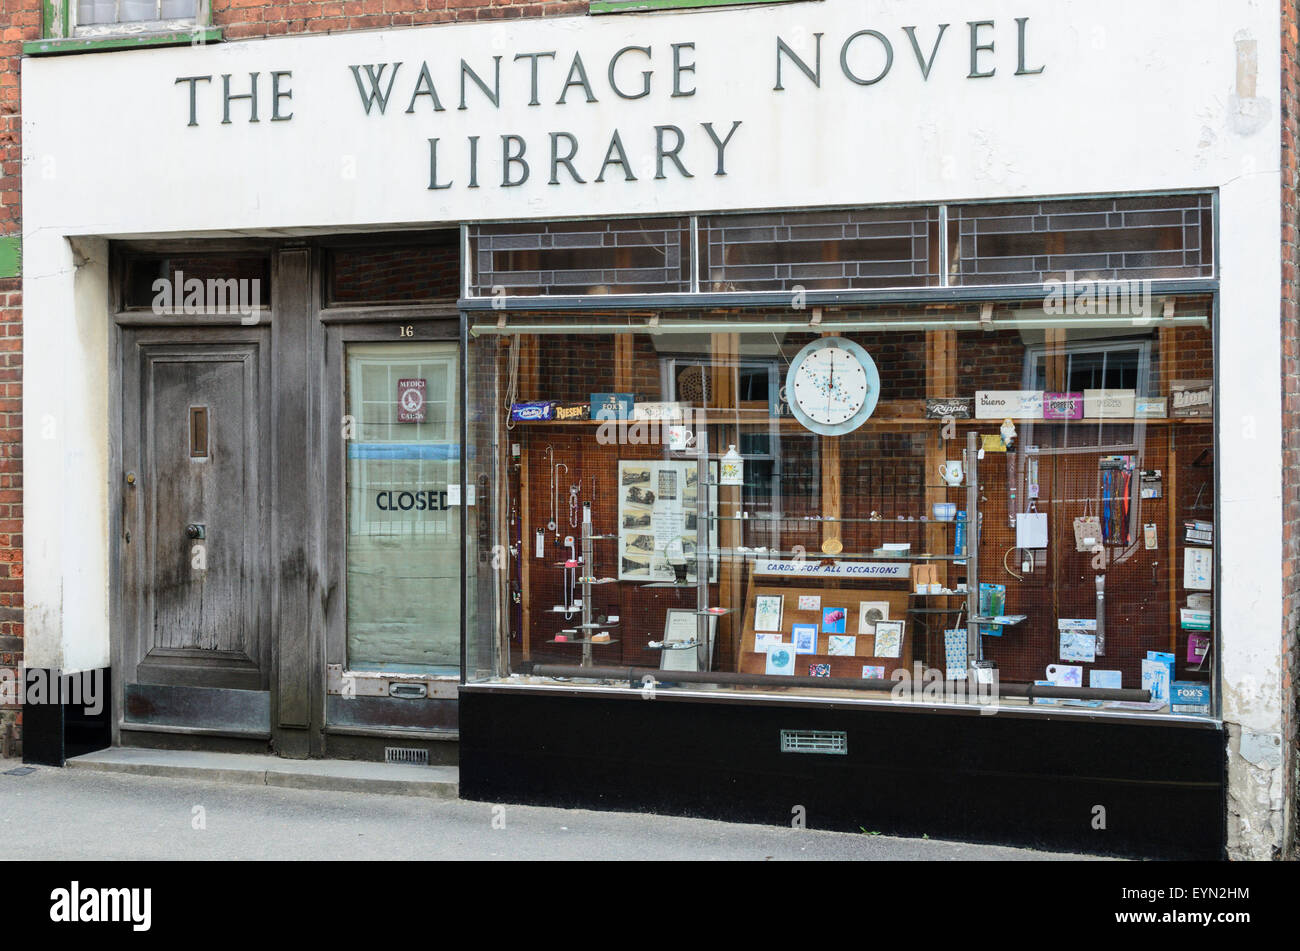 The Wantage Novel Library Shop in Wantage, Oxon, England, UK - Stock Image